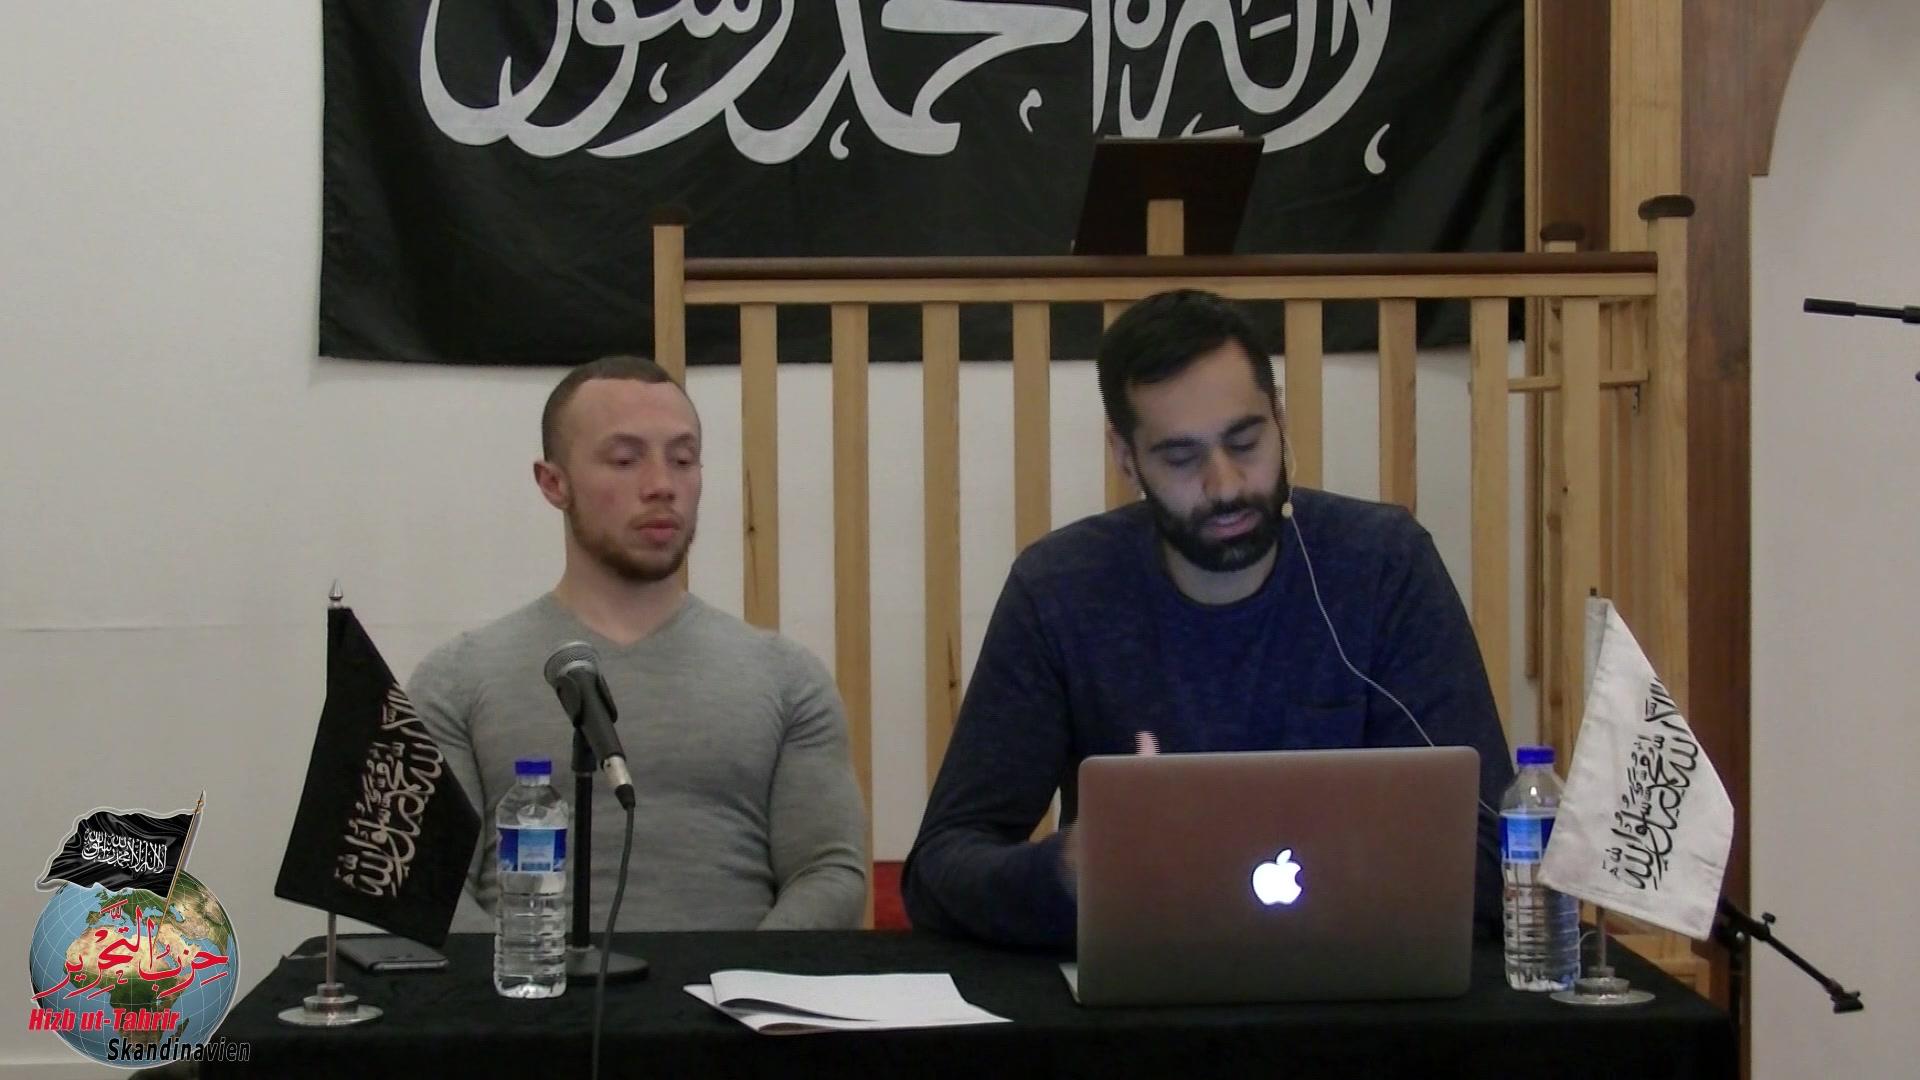 http://hizb-ut-tahrir.dk/video/images/58d435d82d497.jpg